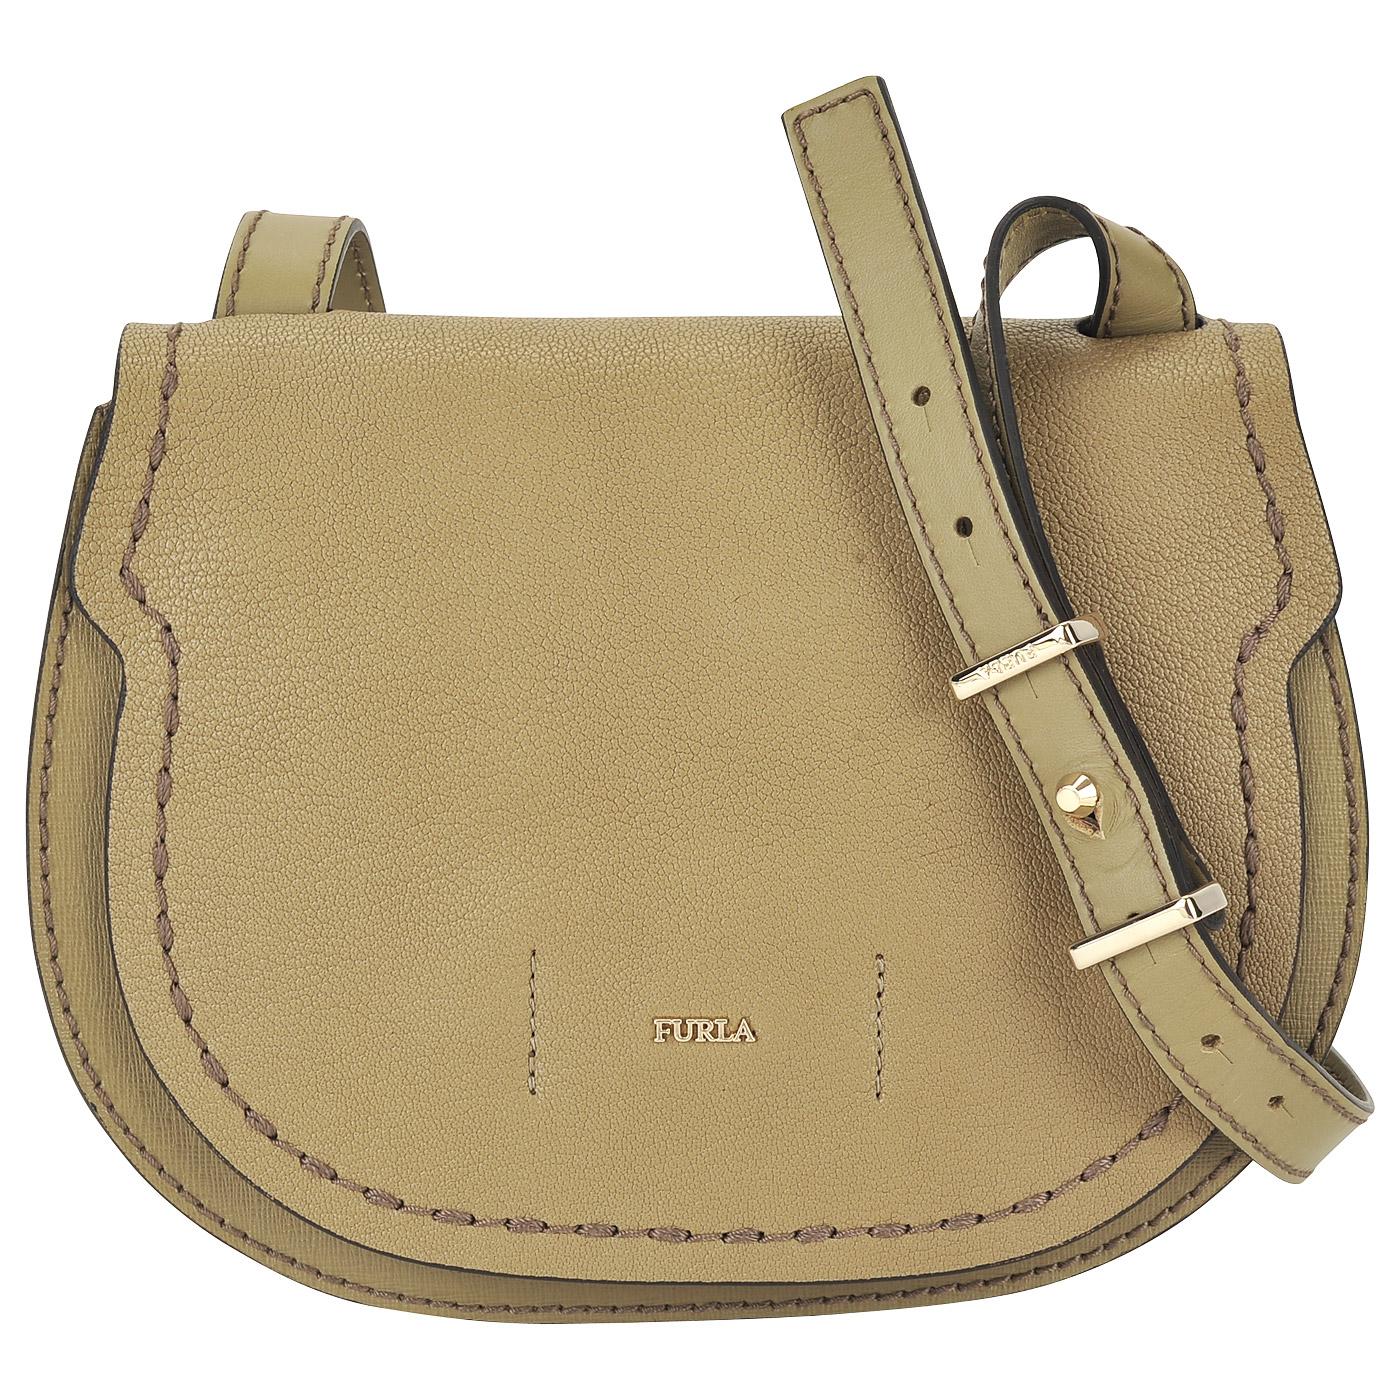 6aa14e67351e Женская кожаная сумка через плечо Furla Gioia BKW7_kaki ...